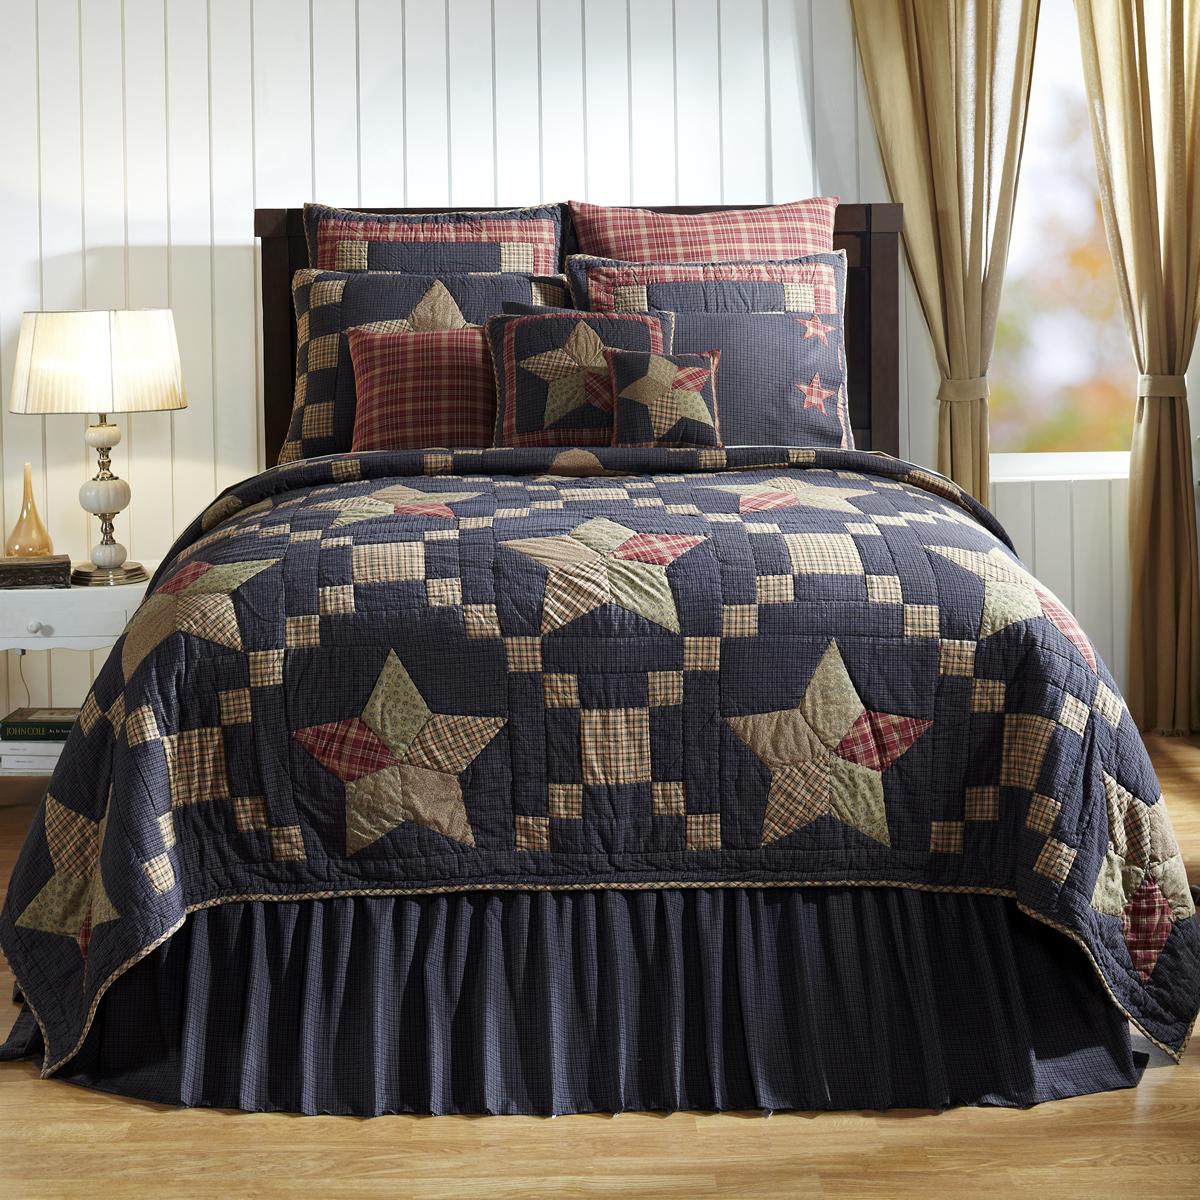 Arlington By Vhc Brands Quilts Beddingsuperstore Com